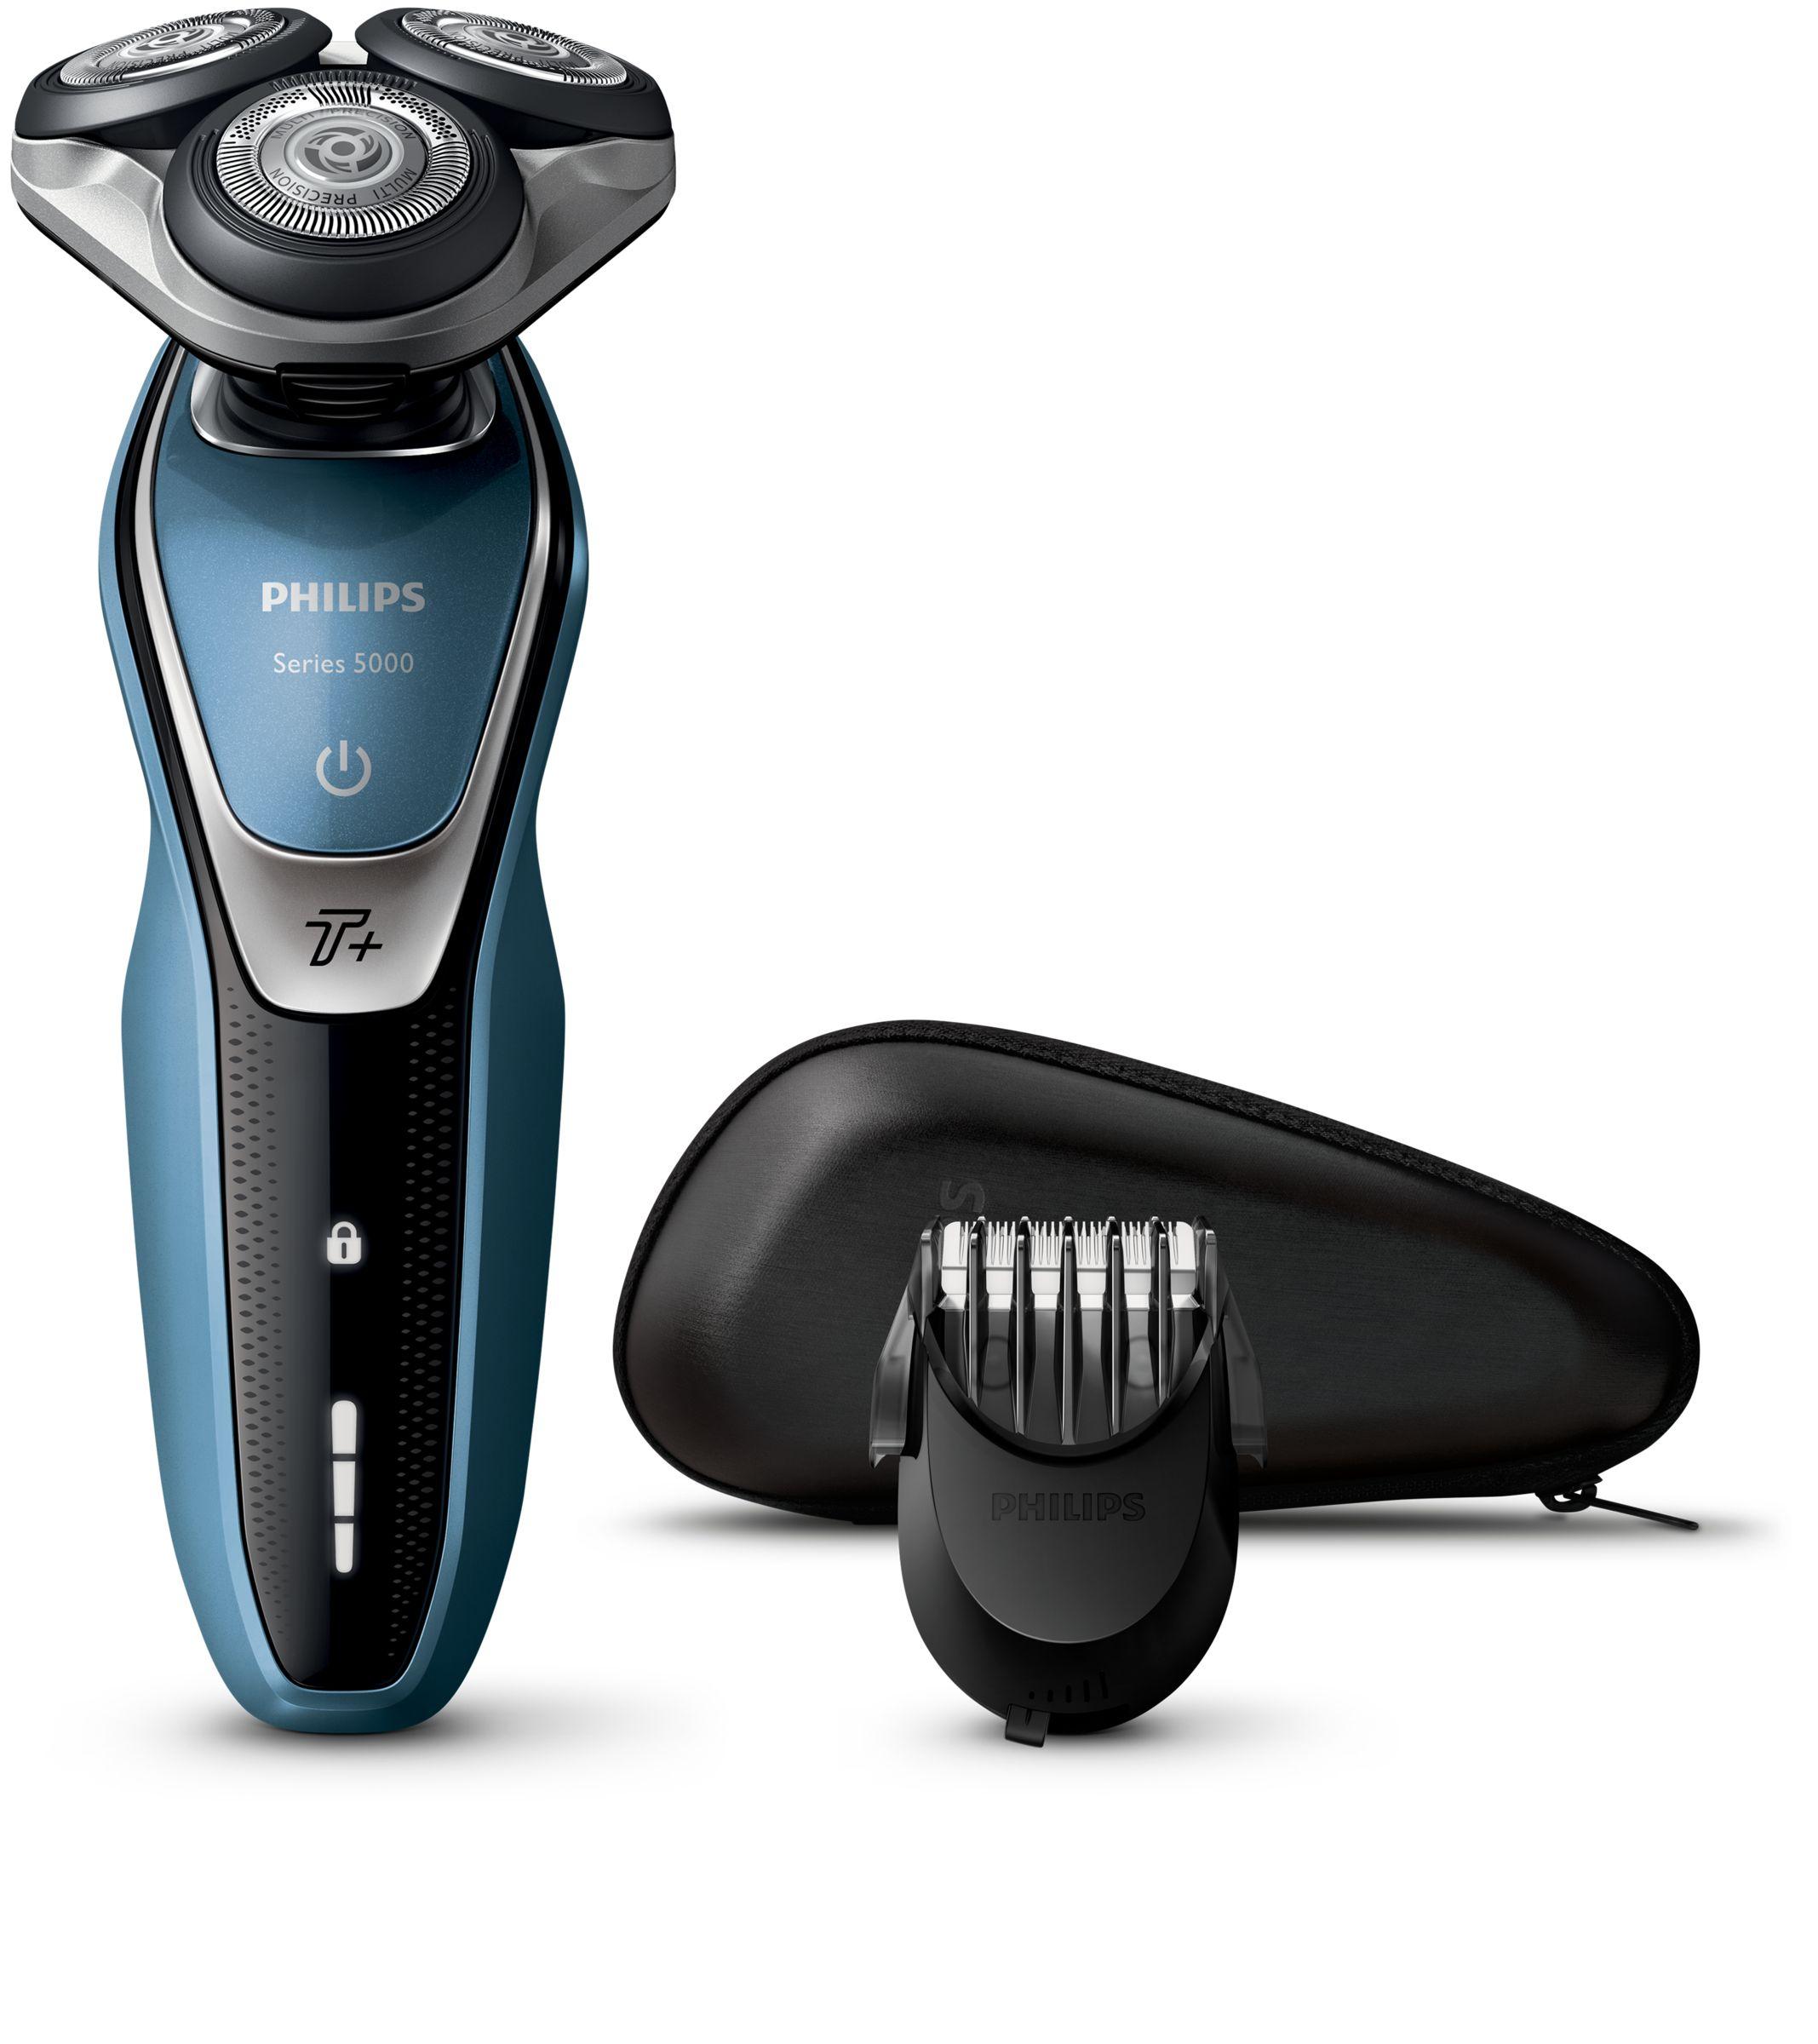 Philips SHAVER Series 5000 Rasoio elettrico Wet & Dry S5630/41